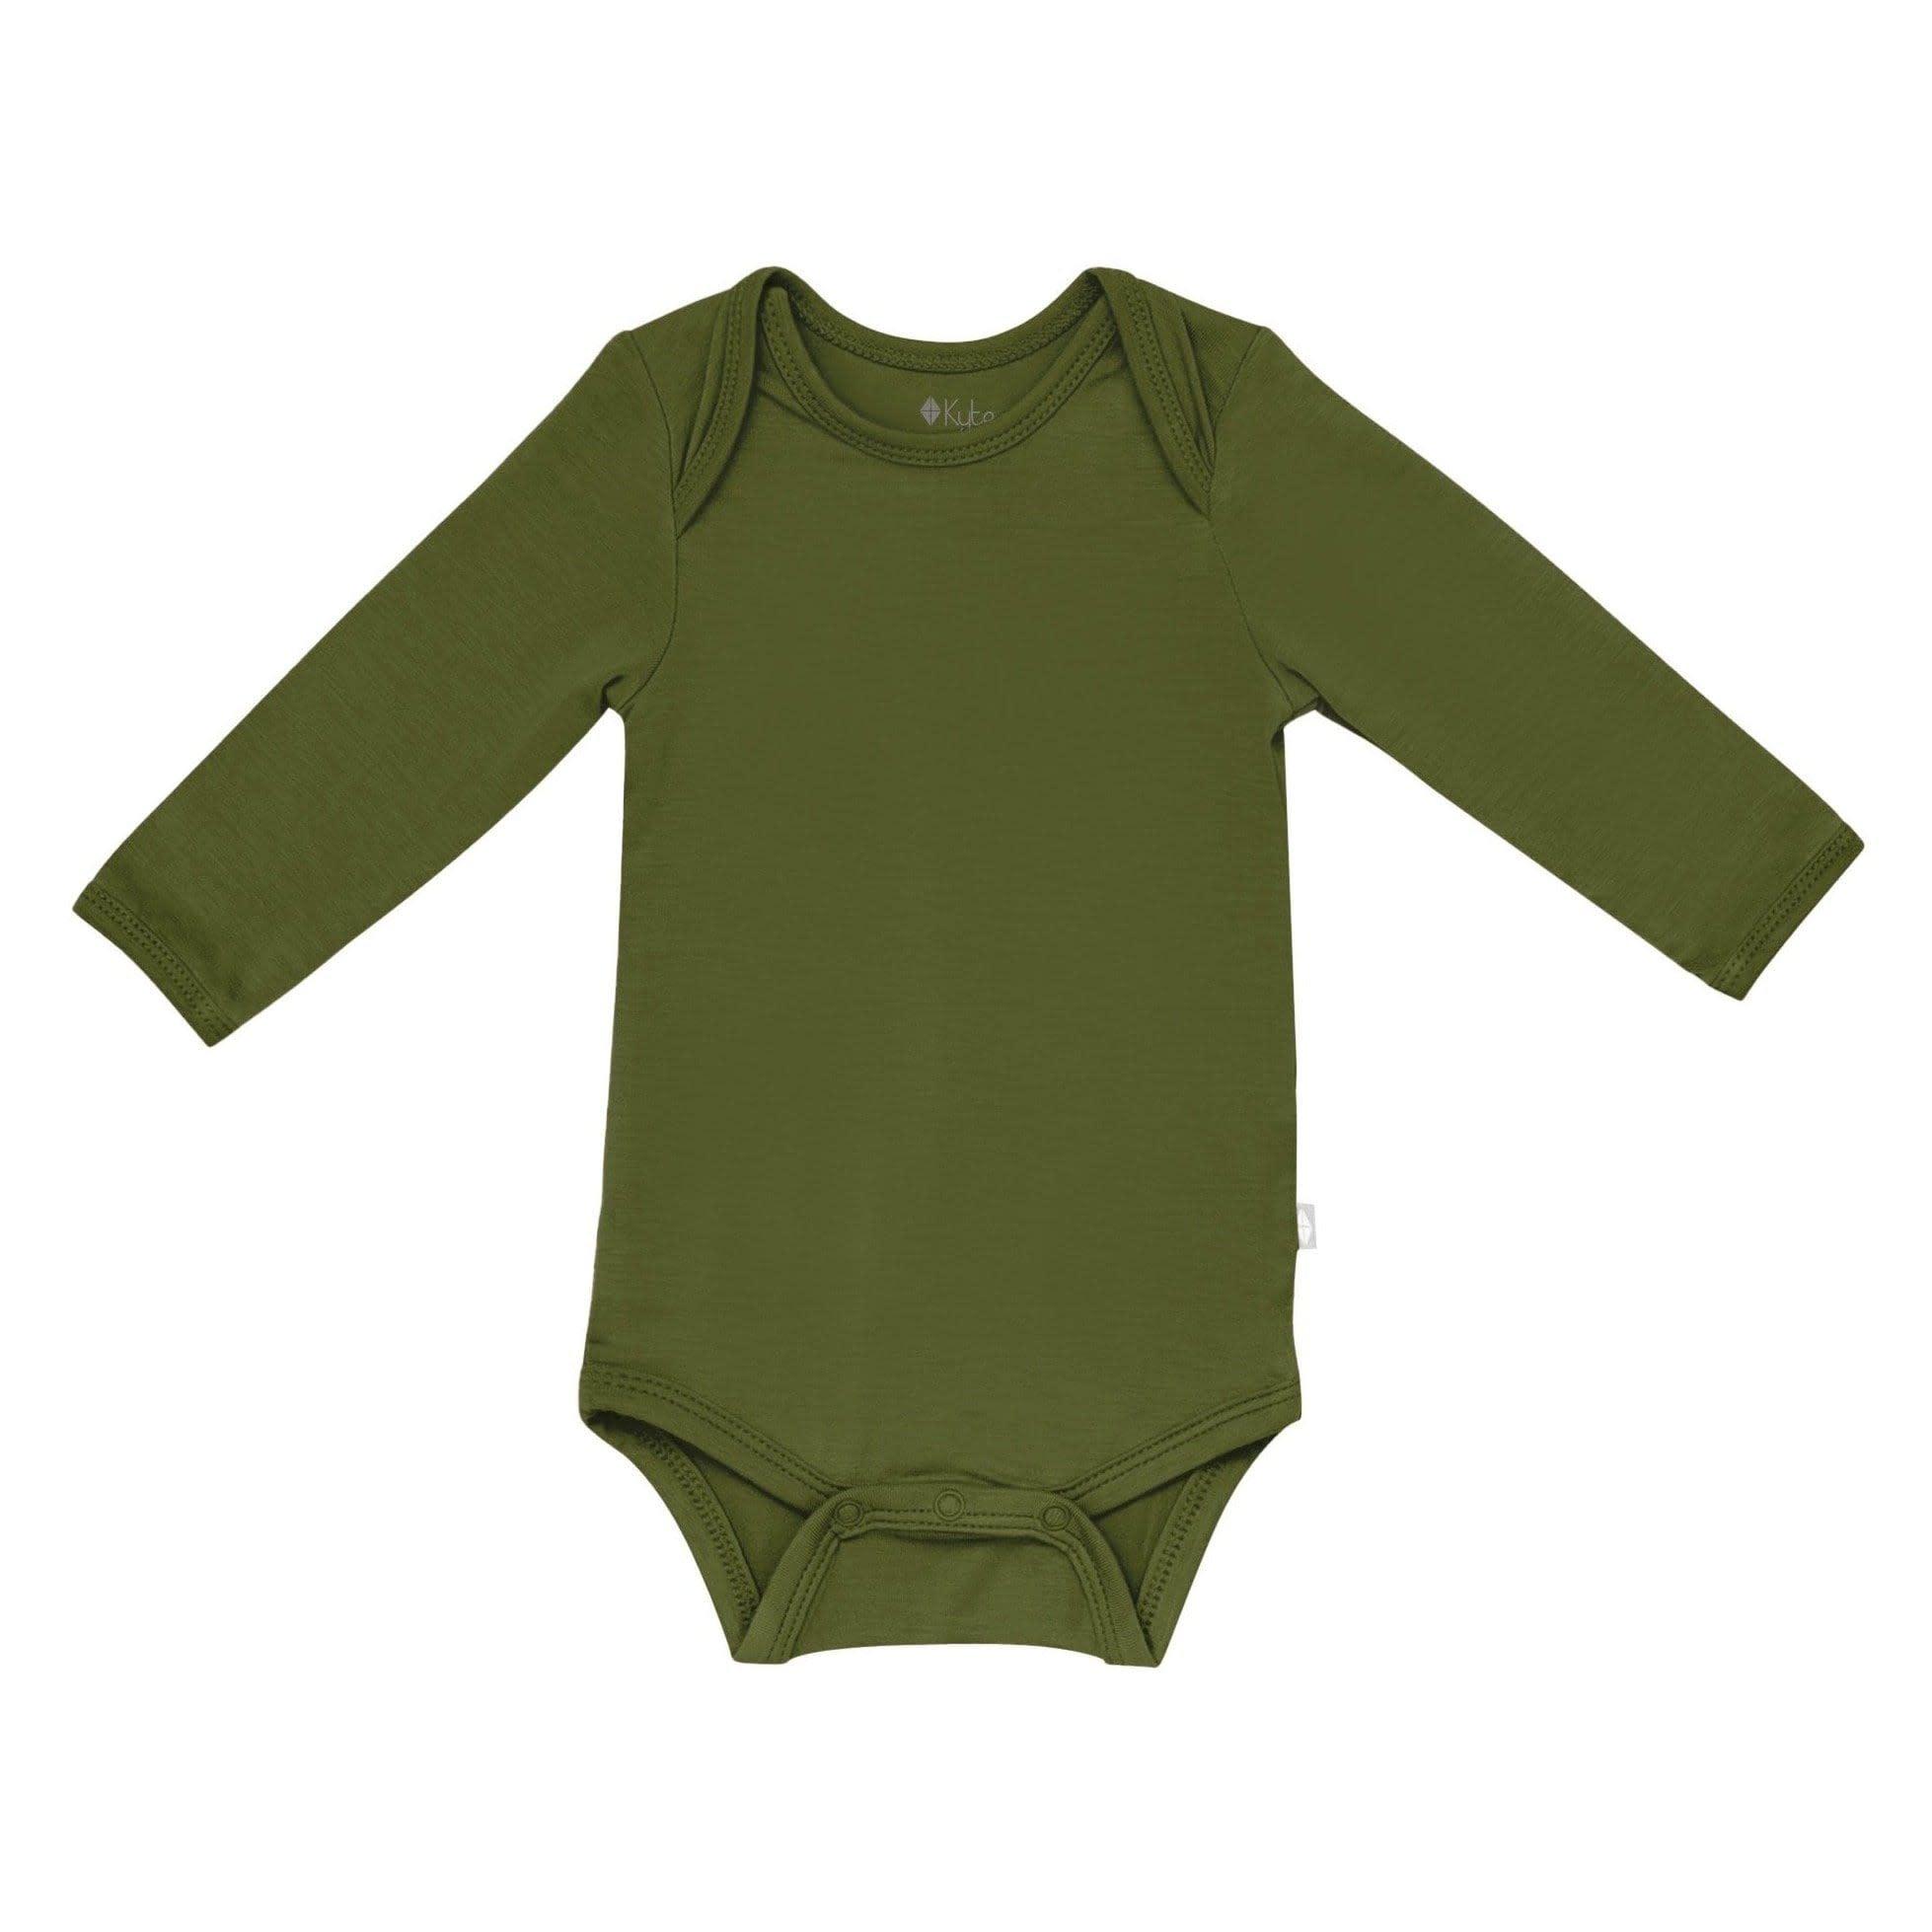 Kyte Baby Long Sleeve Bodysuit - Olive